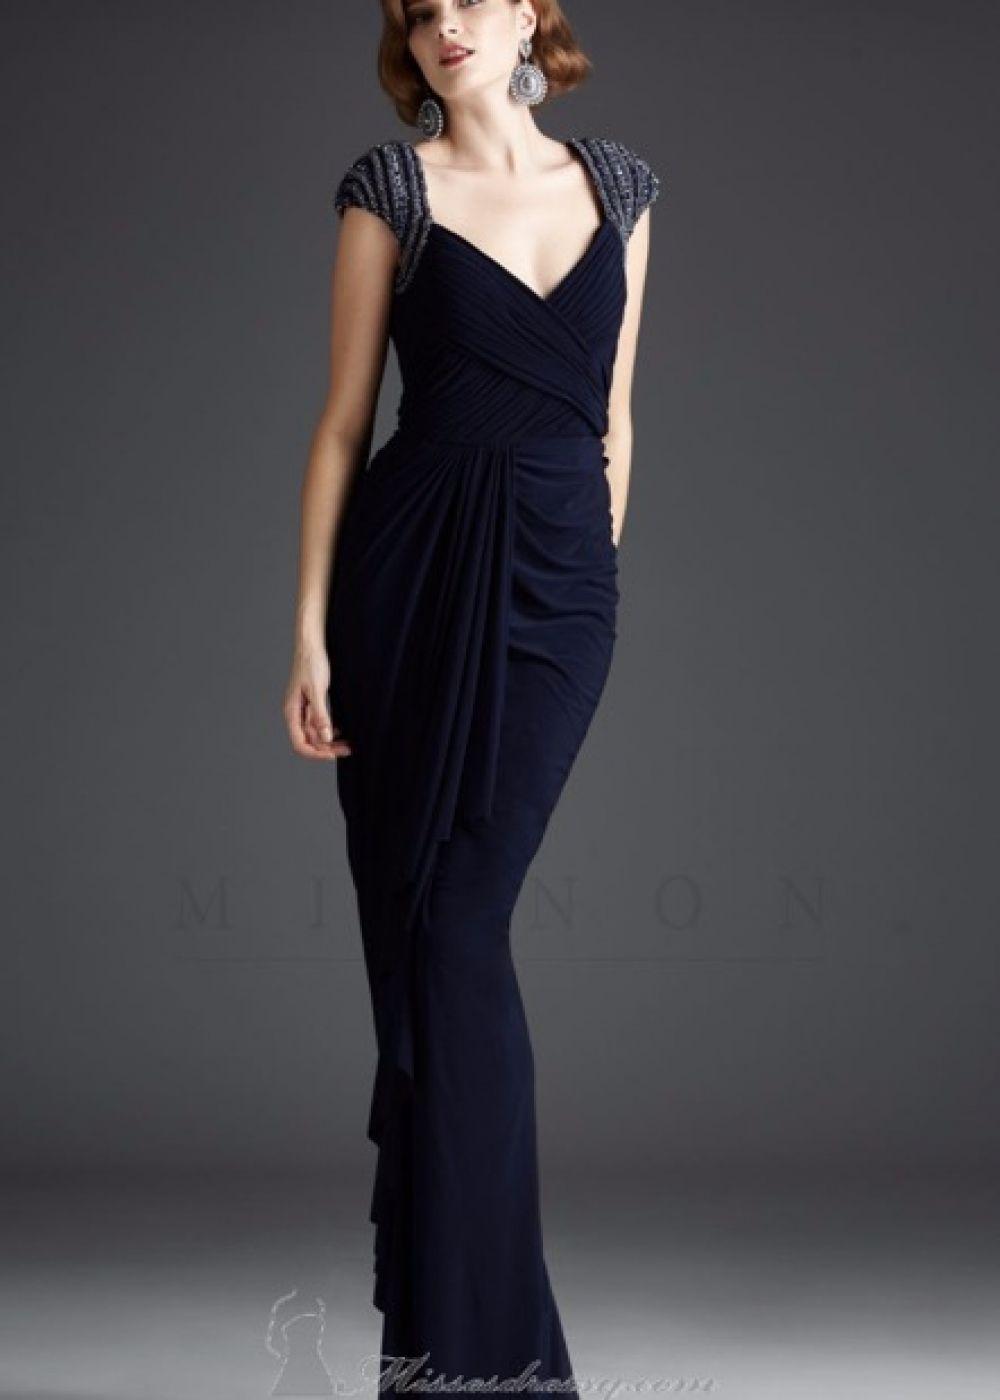 Vm mignon party dresses pinterest sassy red carpet and